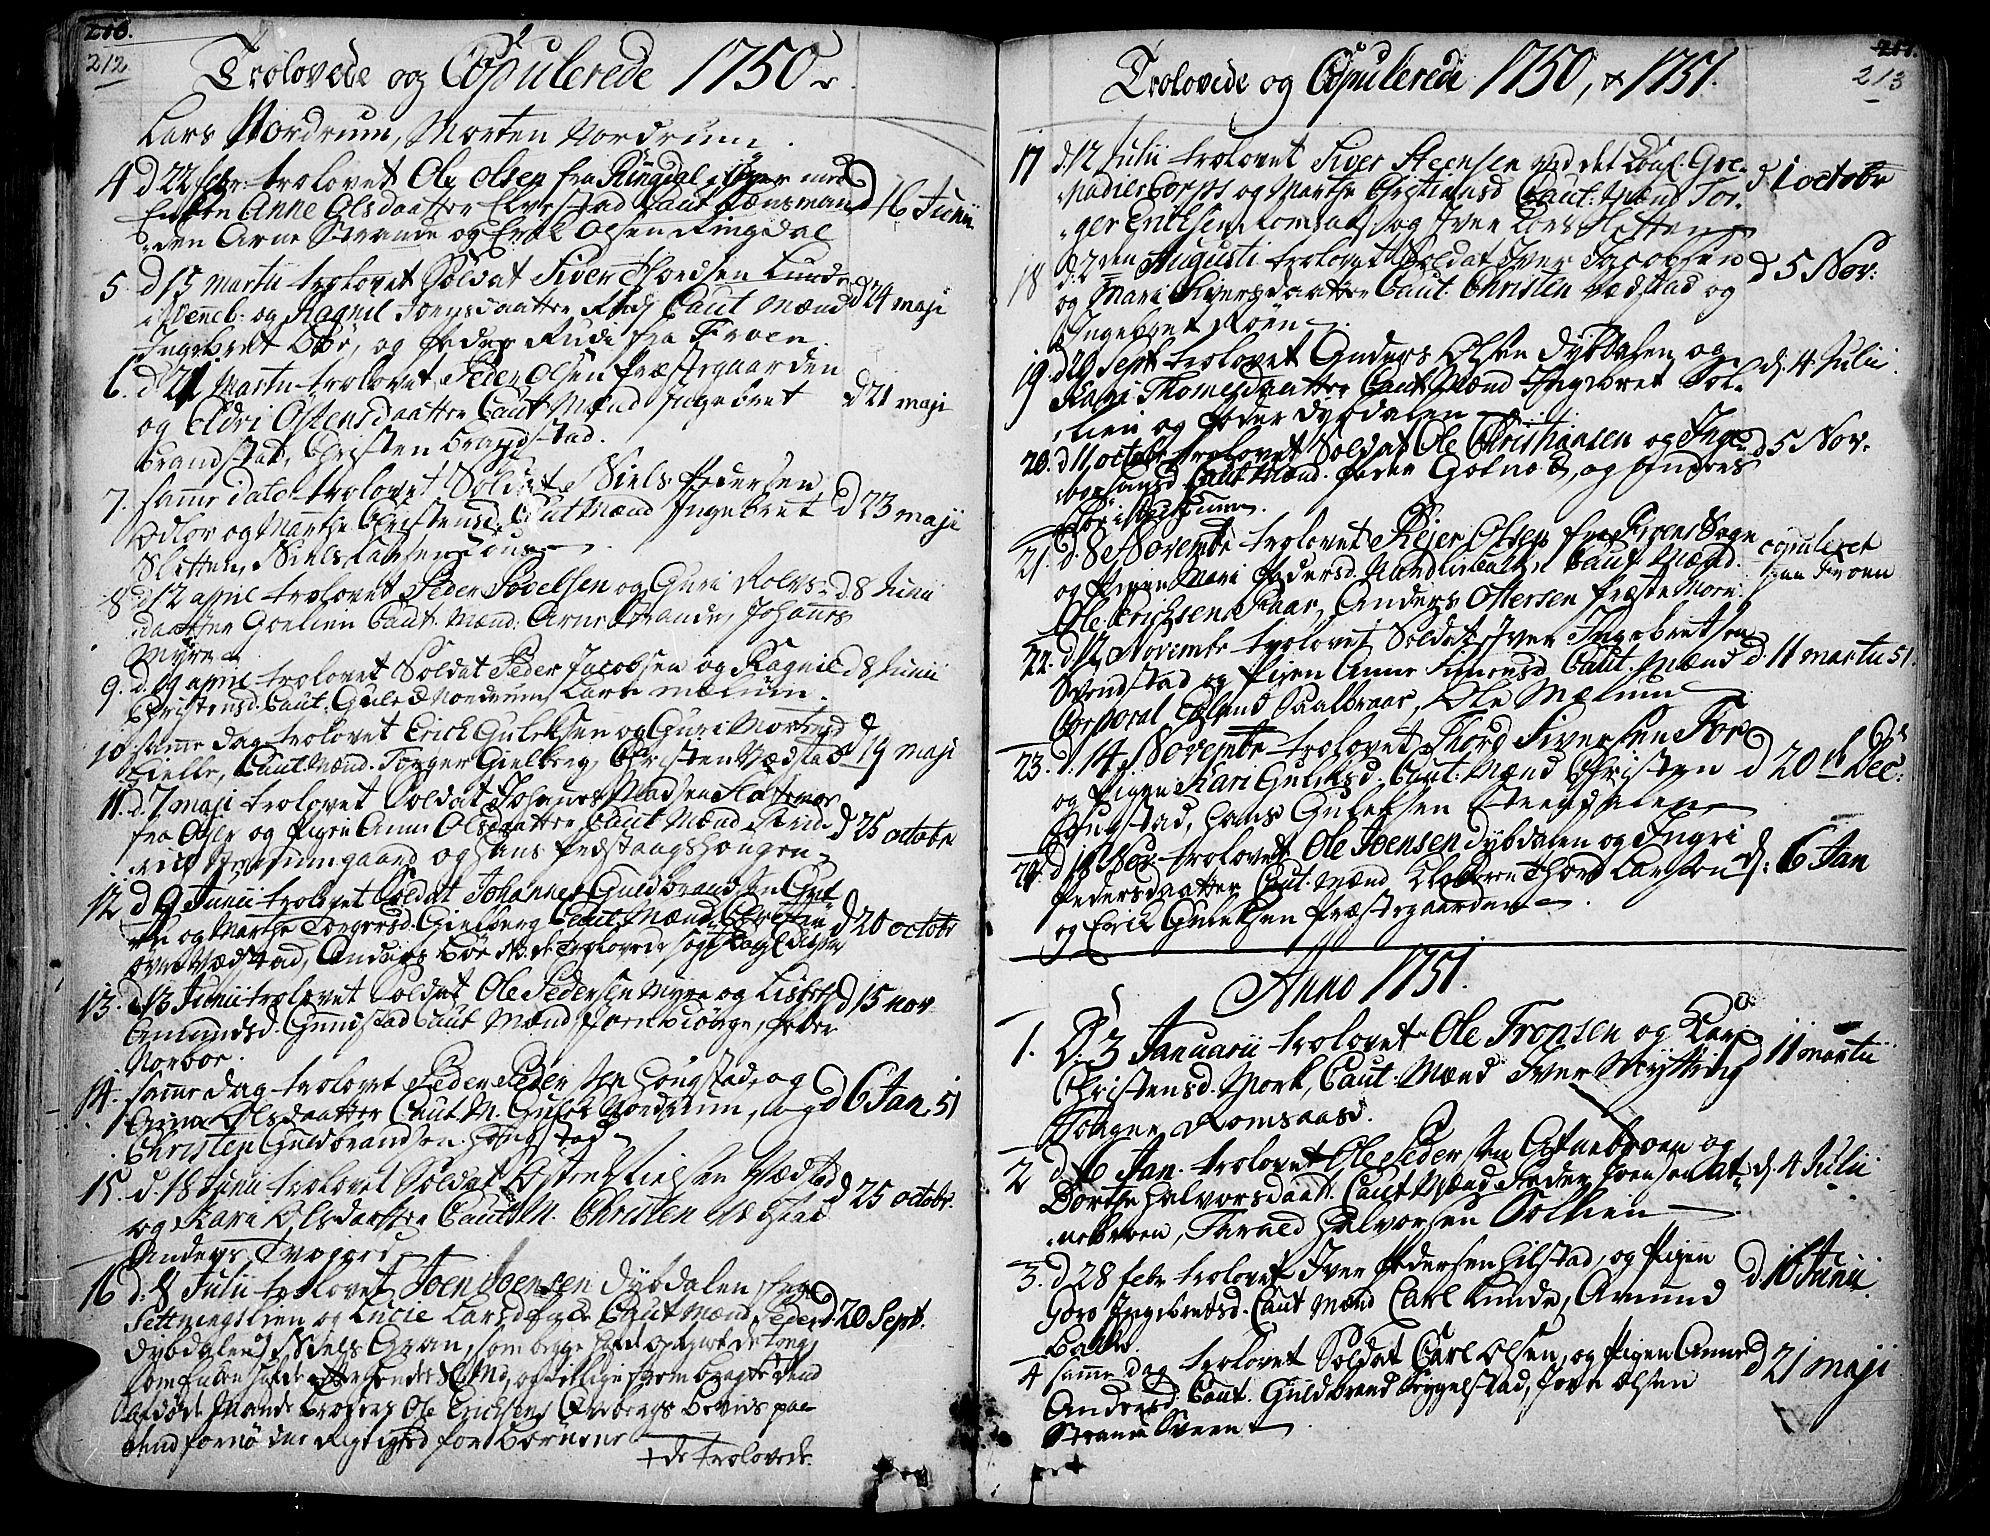 SAH, Ringebu prestekontor, Ministerialbok nr. 2, 1734-1780, s. 212-213